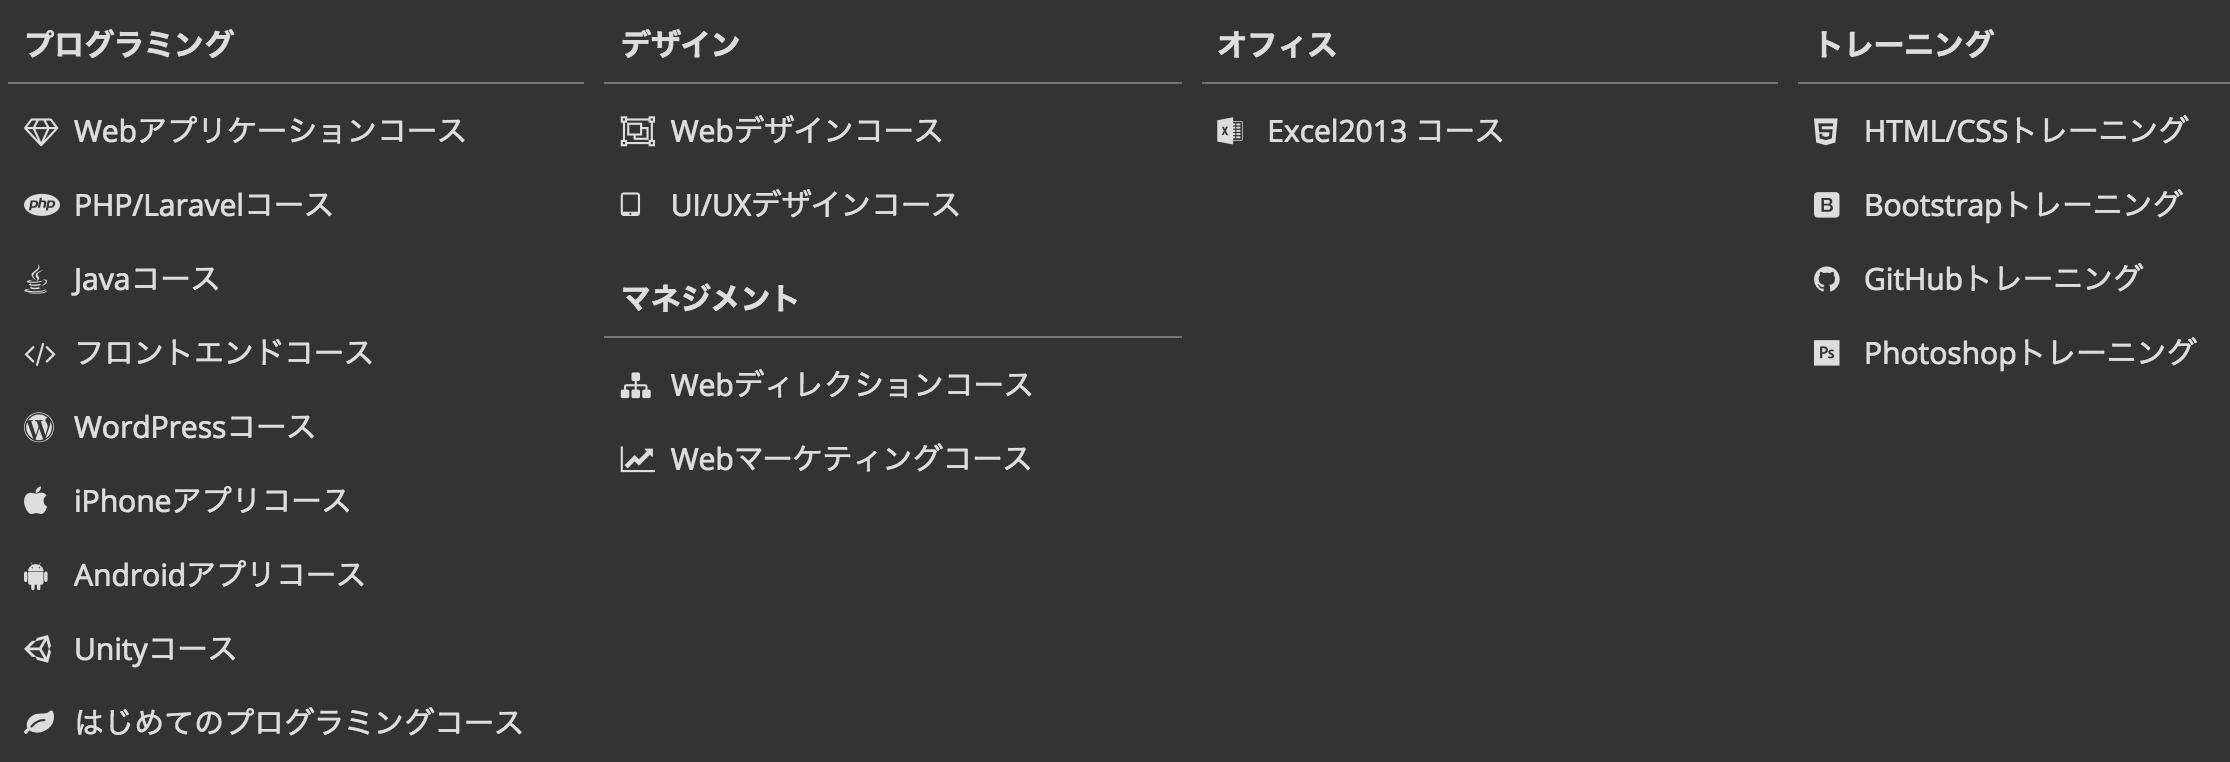 TechAcademy(テックアカデミー)-cource